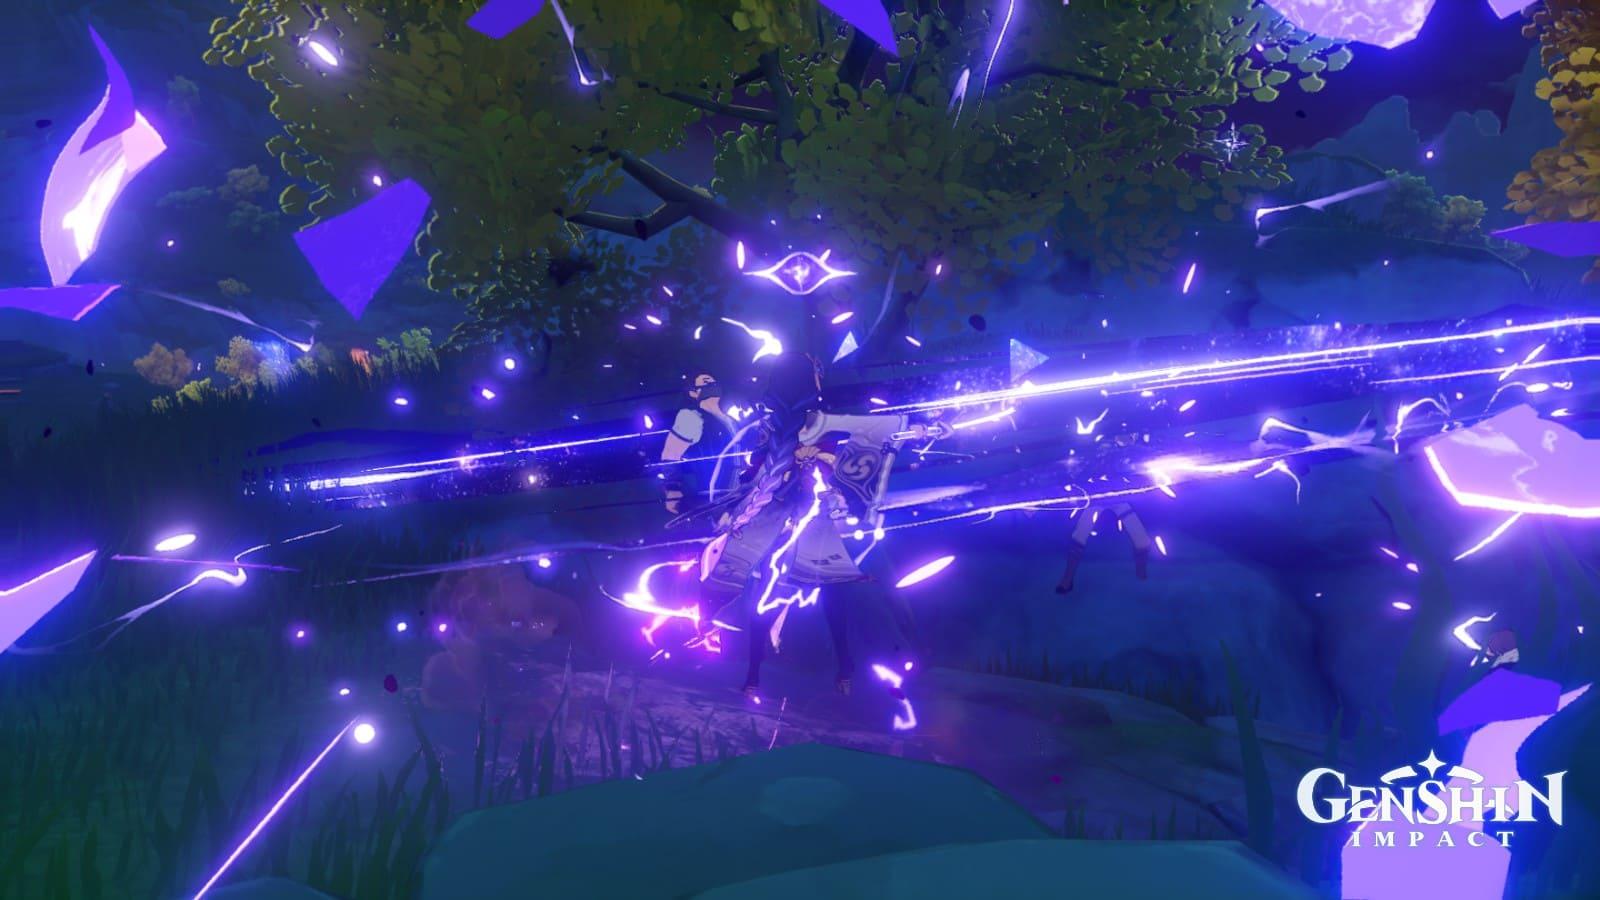 Genshin Impact - Raiden Shogun ท่าไม้ตายในเกม